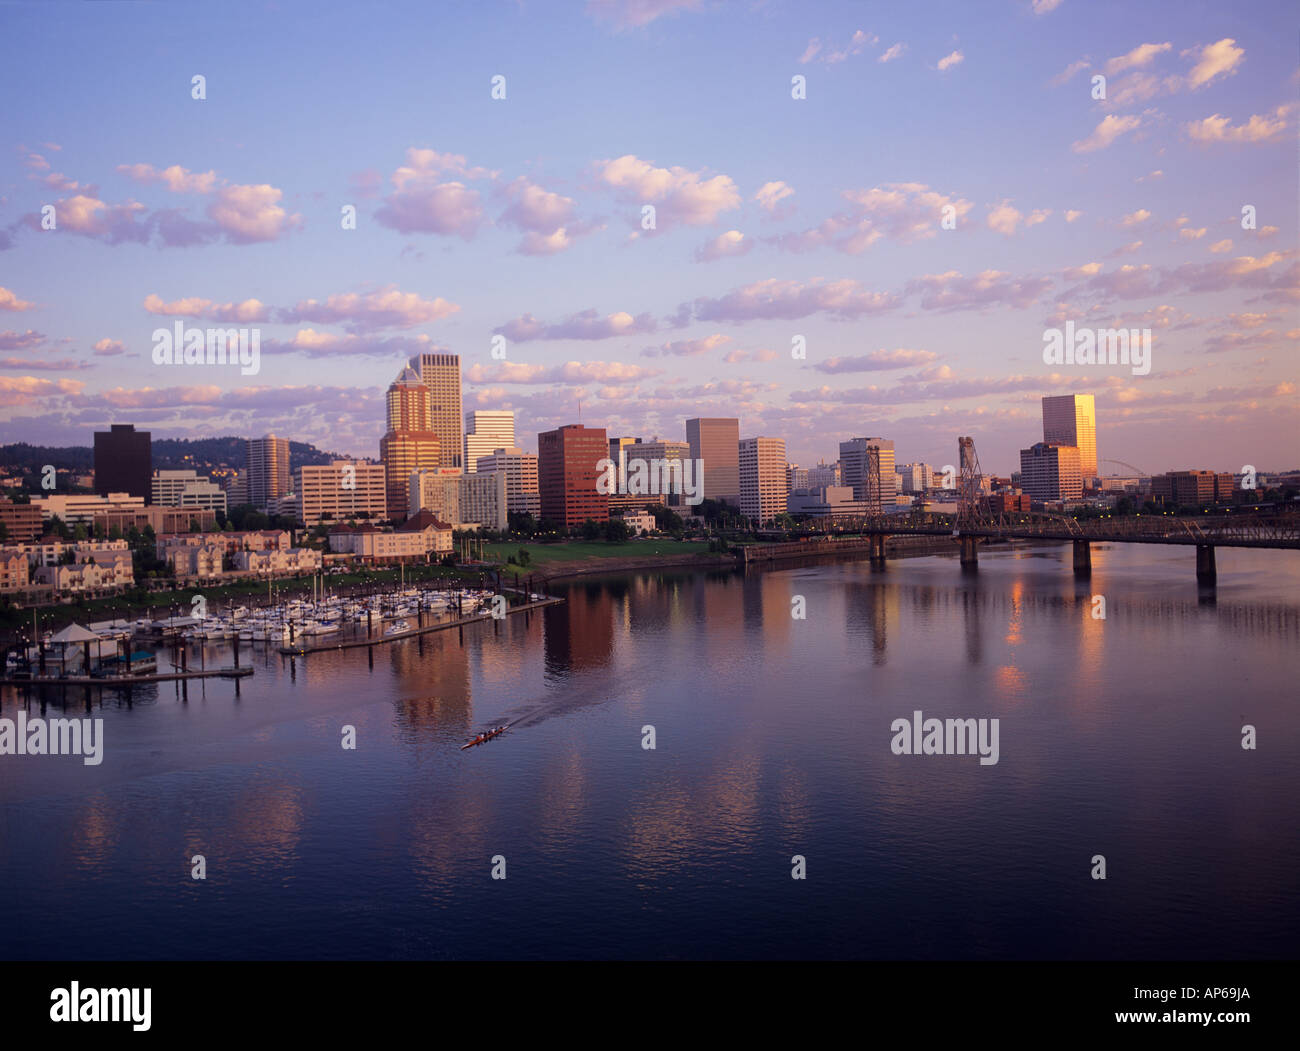 usa-oregon-portland-early-morning-light-